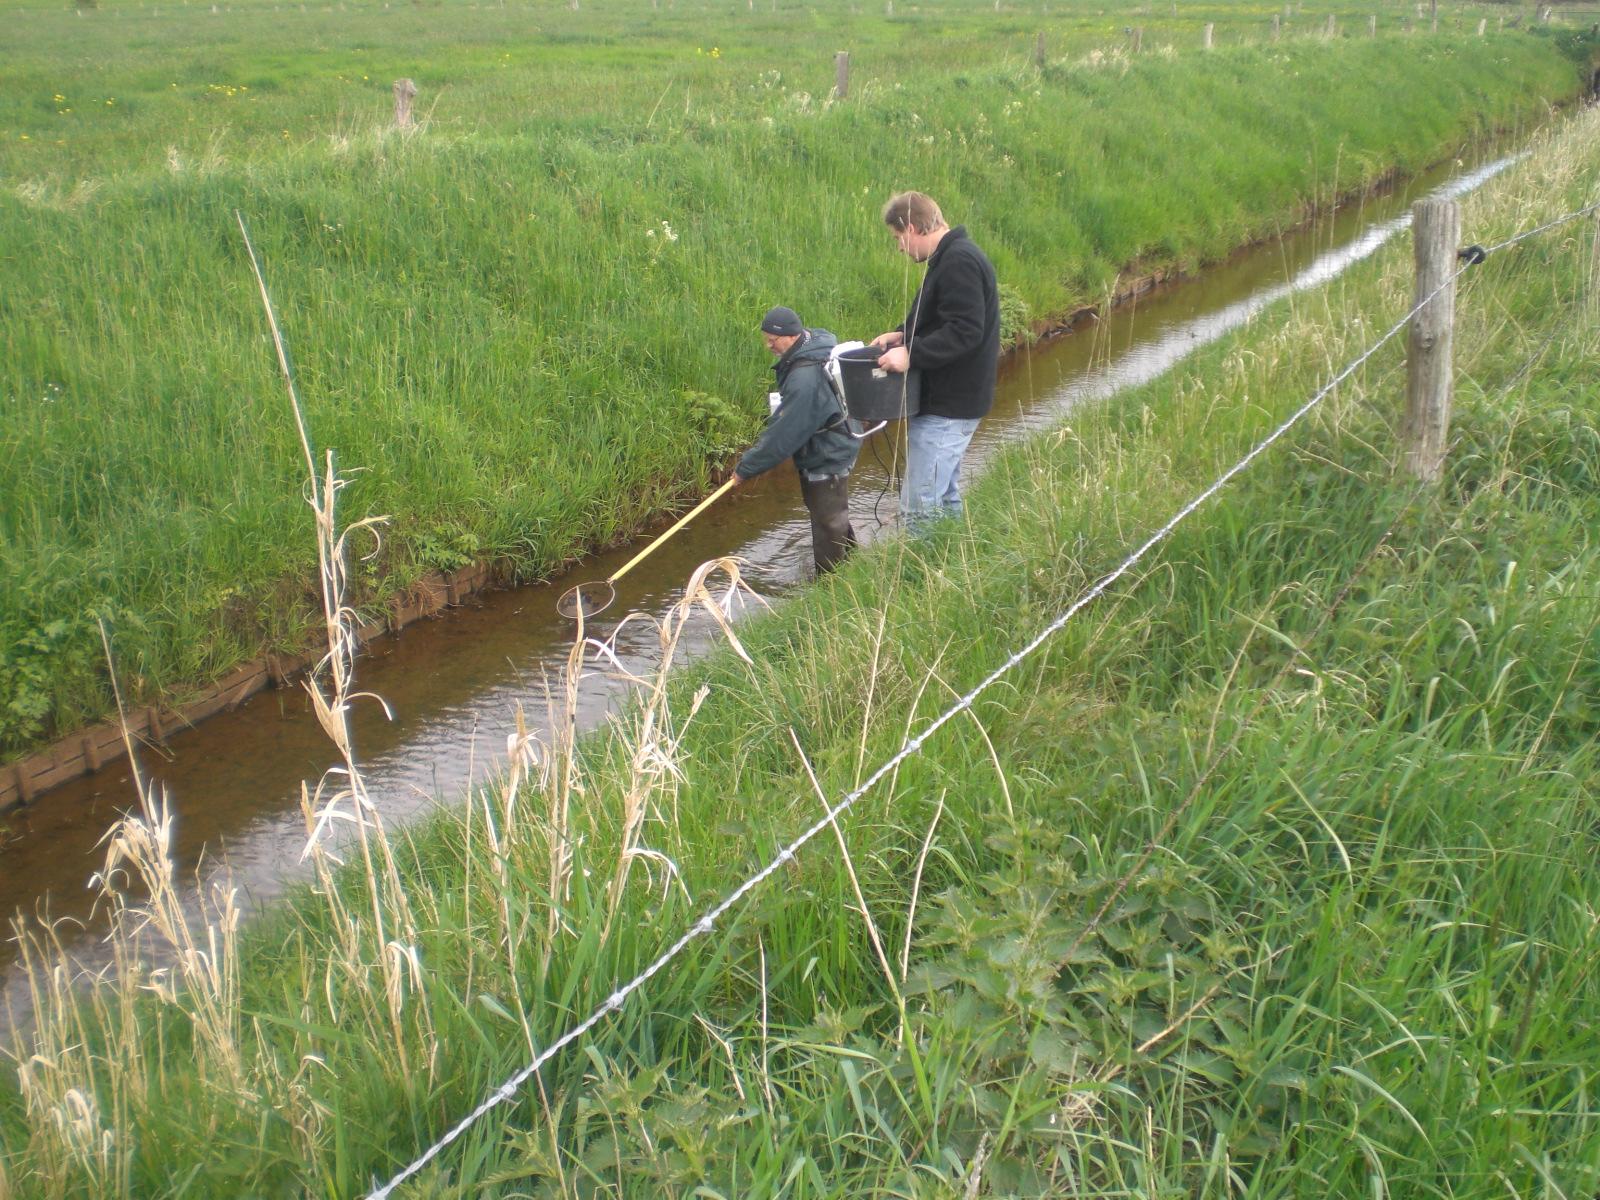 Fischbestandserfassung mittel Elektrofischerei. Foto: Herbert Müller, SFV Varel.